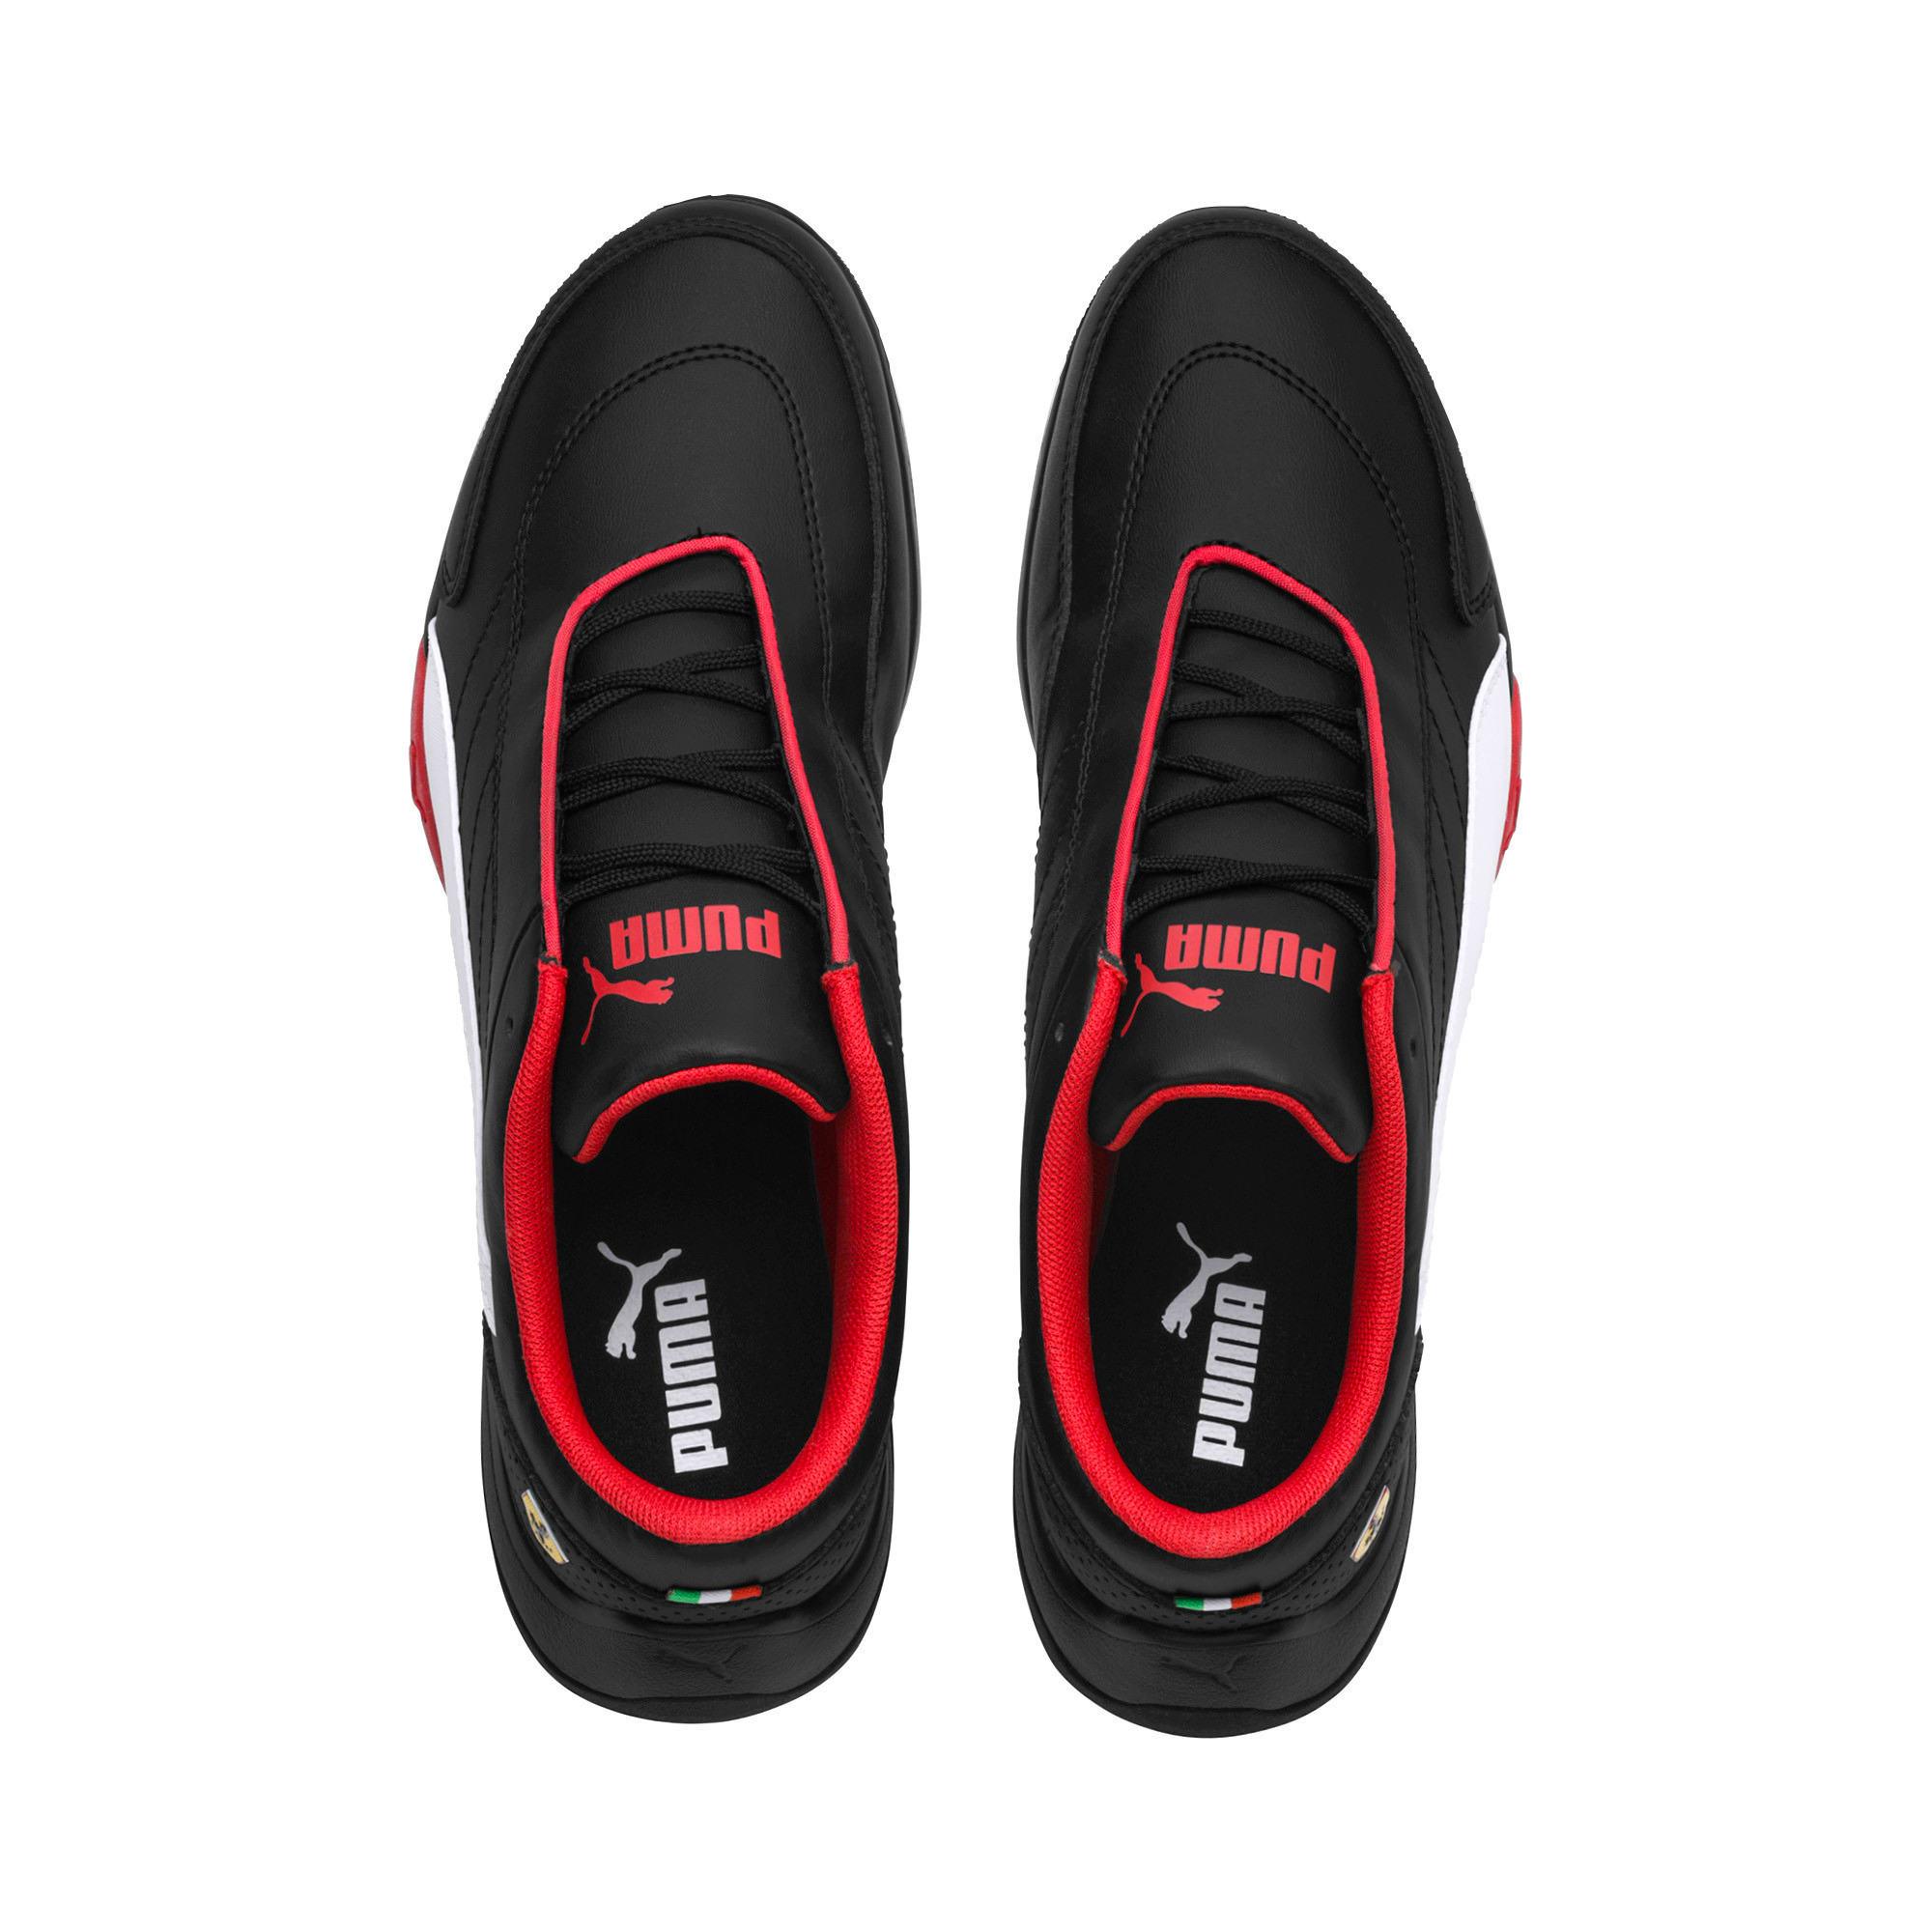 Thumbnail 6 of Scuderia Ferrari Kart Cat III Shoes, Puma Black-Puma White, medium